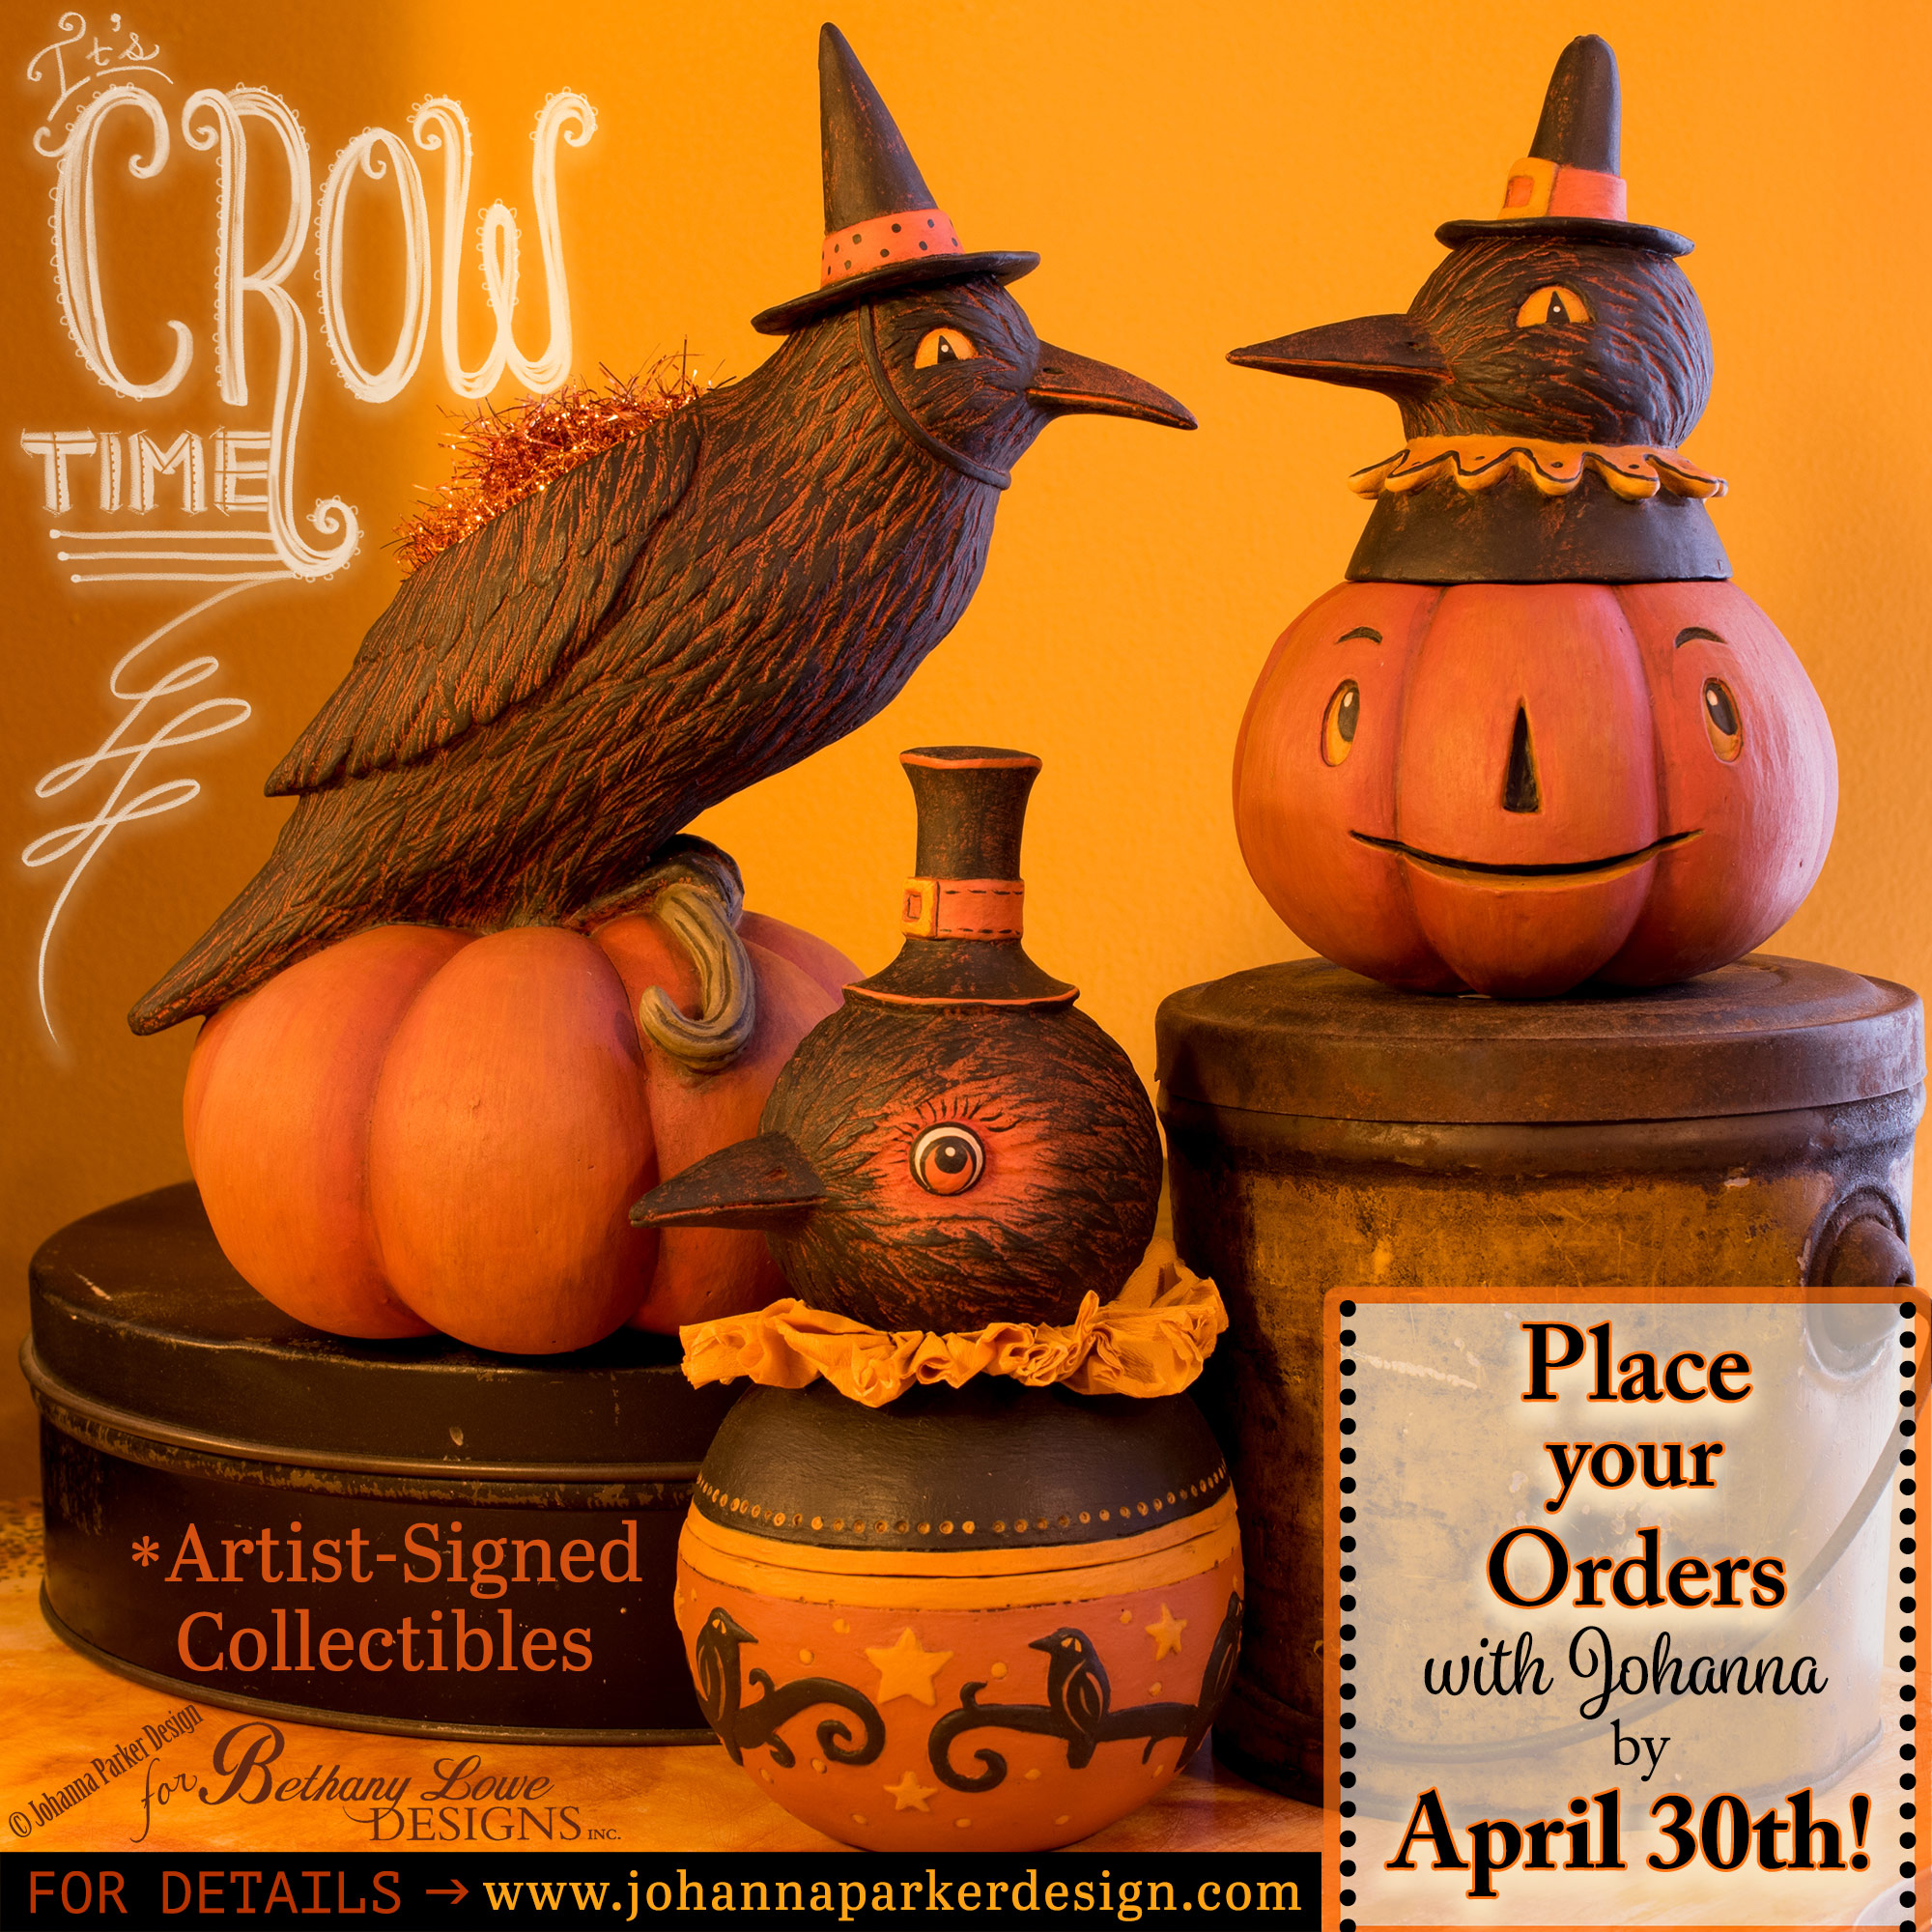 It's-Crow-Time-Johanna-Parker-Halloween.jpg